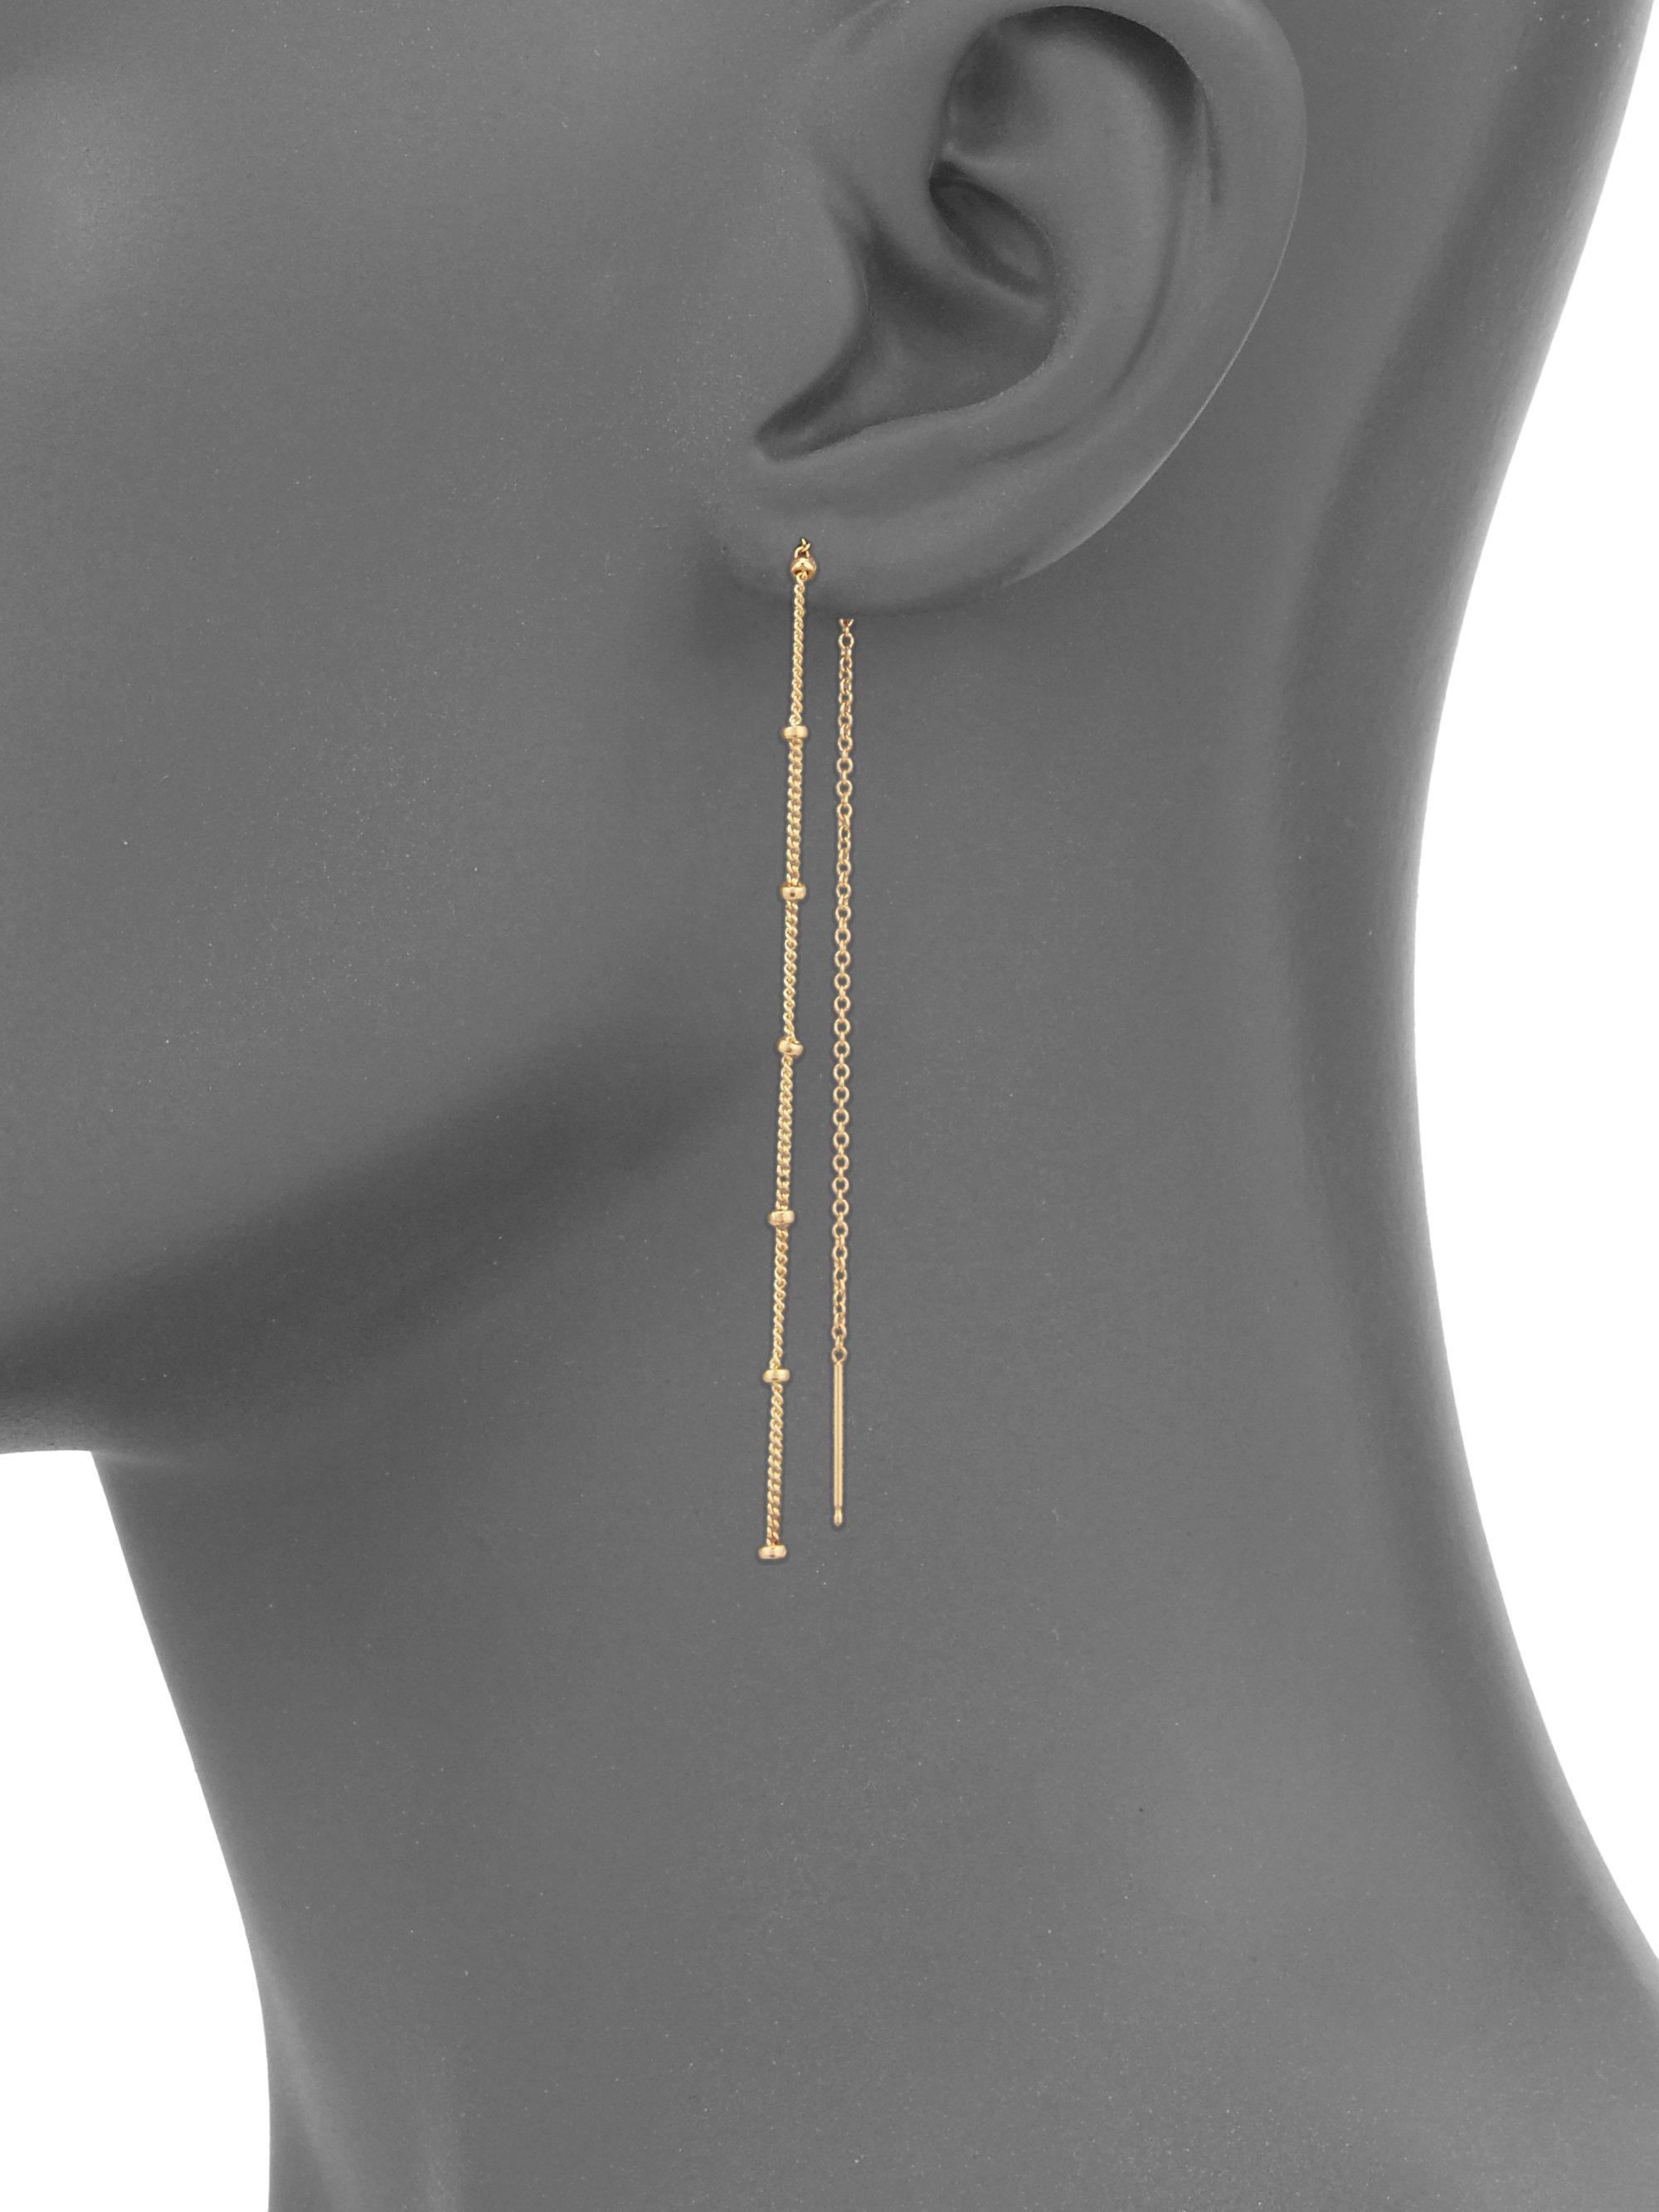 Yellow Gold Chain Threader Earrings Lyst View Fullscreen